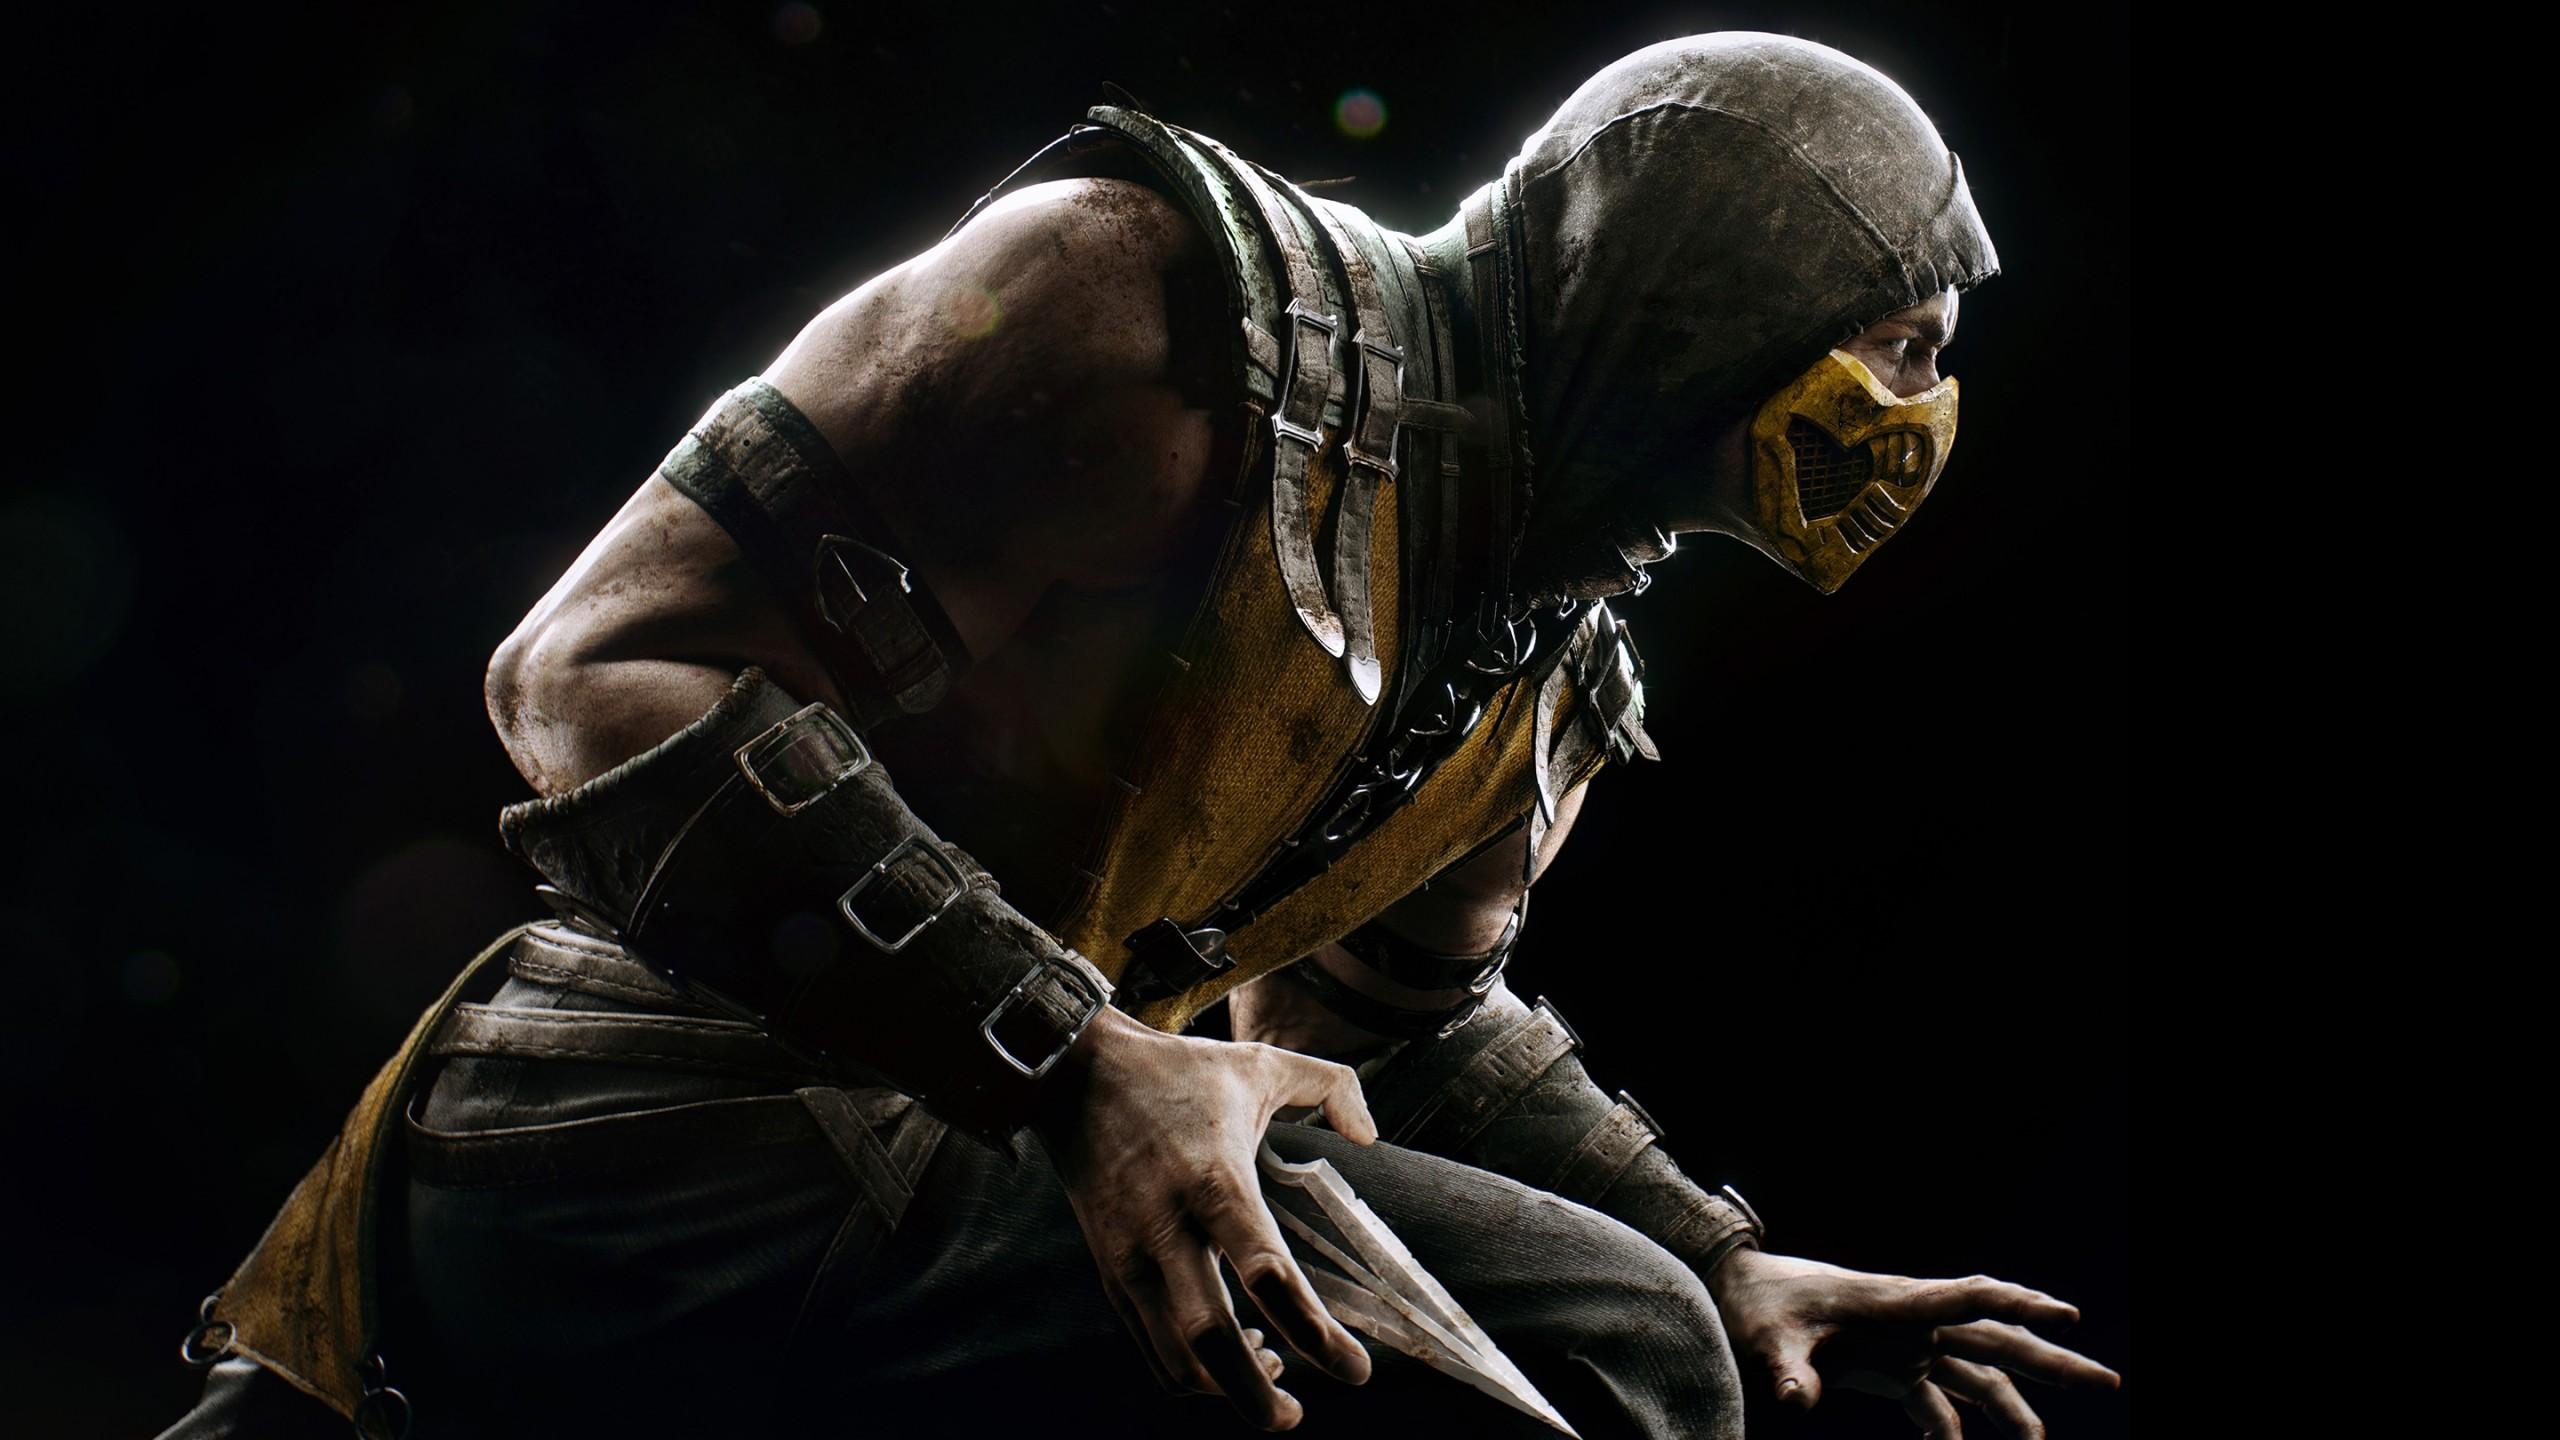 Wallpaper mortal kombat x, scorpio, ninja, pose